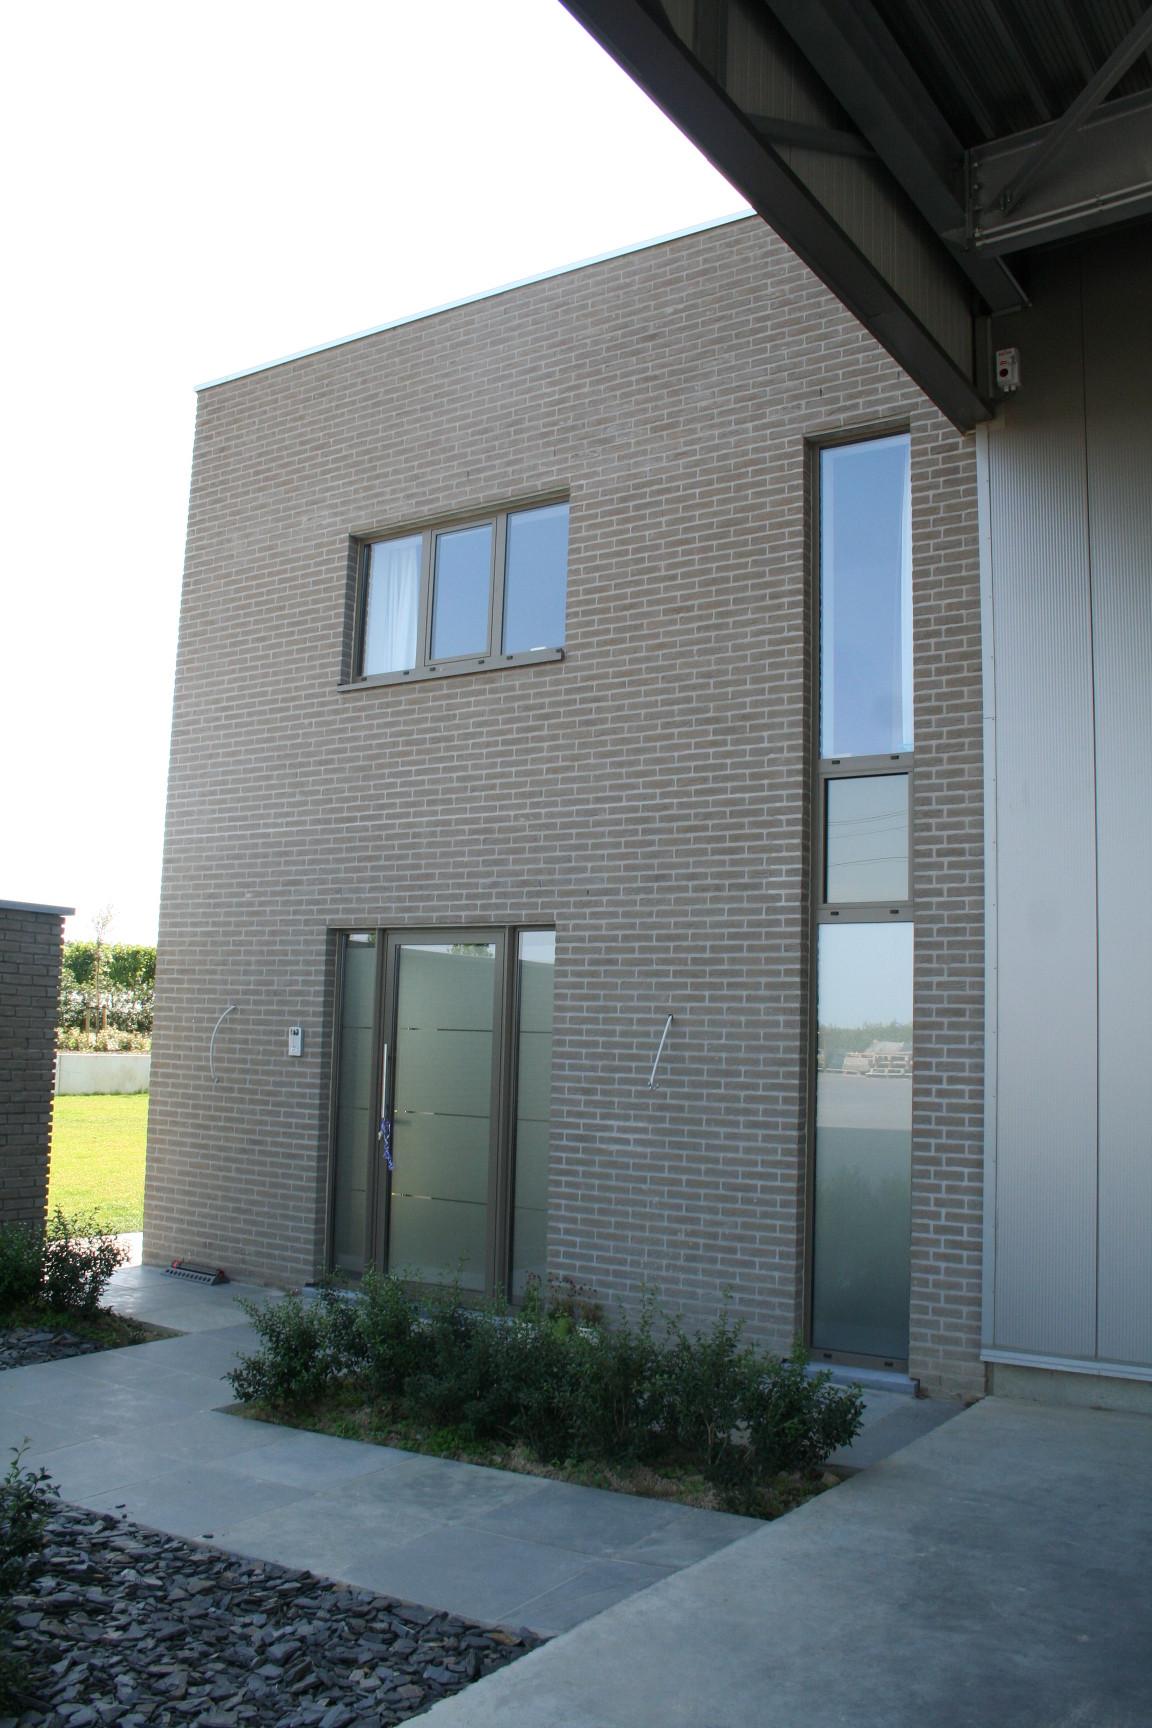 Carubin_Pittem_kmo-gebouw met geïntegreerde woning (2)